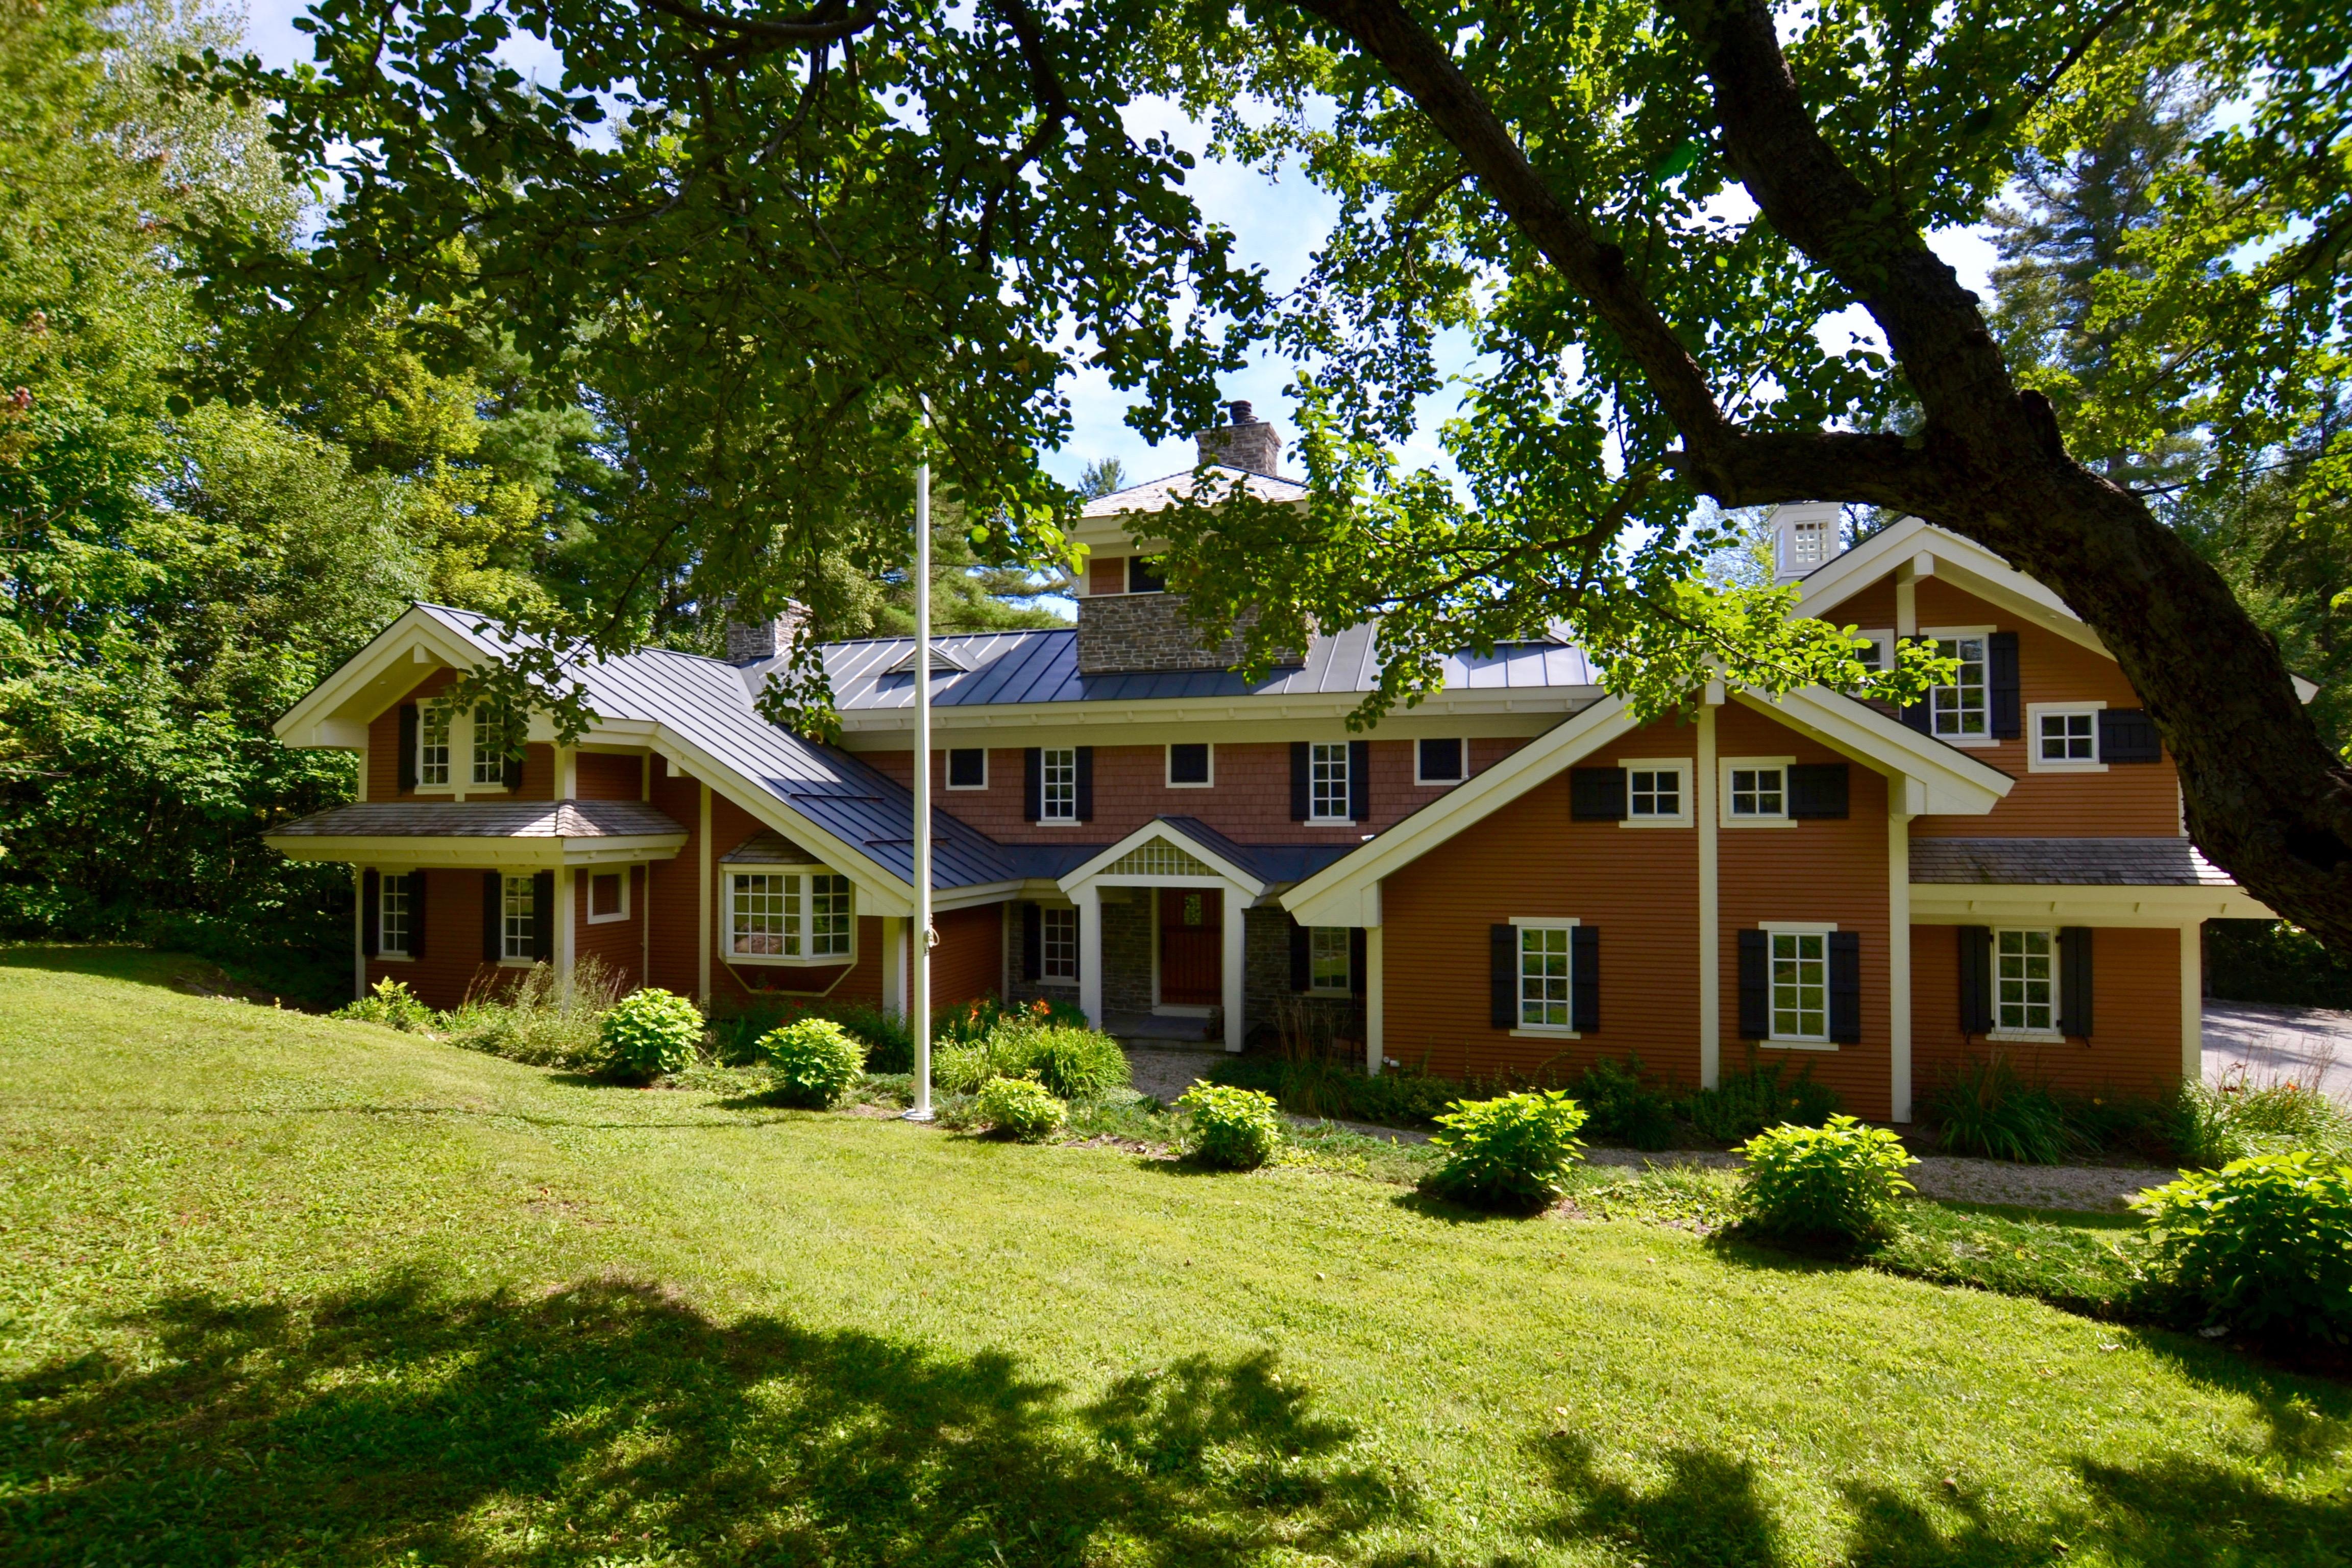 Villa per Vendita alle ore 48 Southview Path, Killington Killington, Vermont, 05751 Stati Uniti